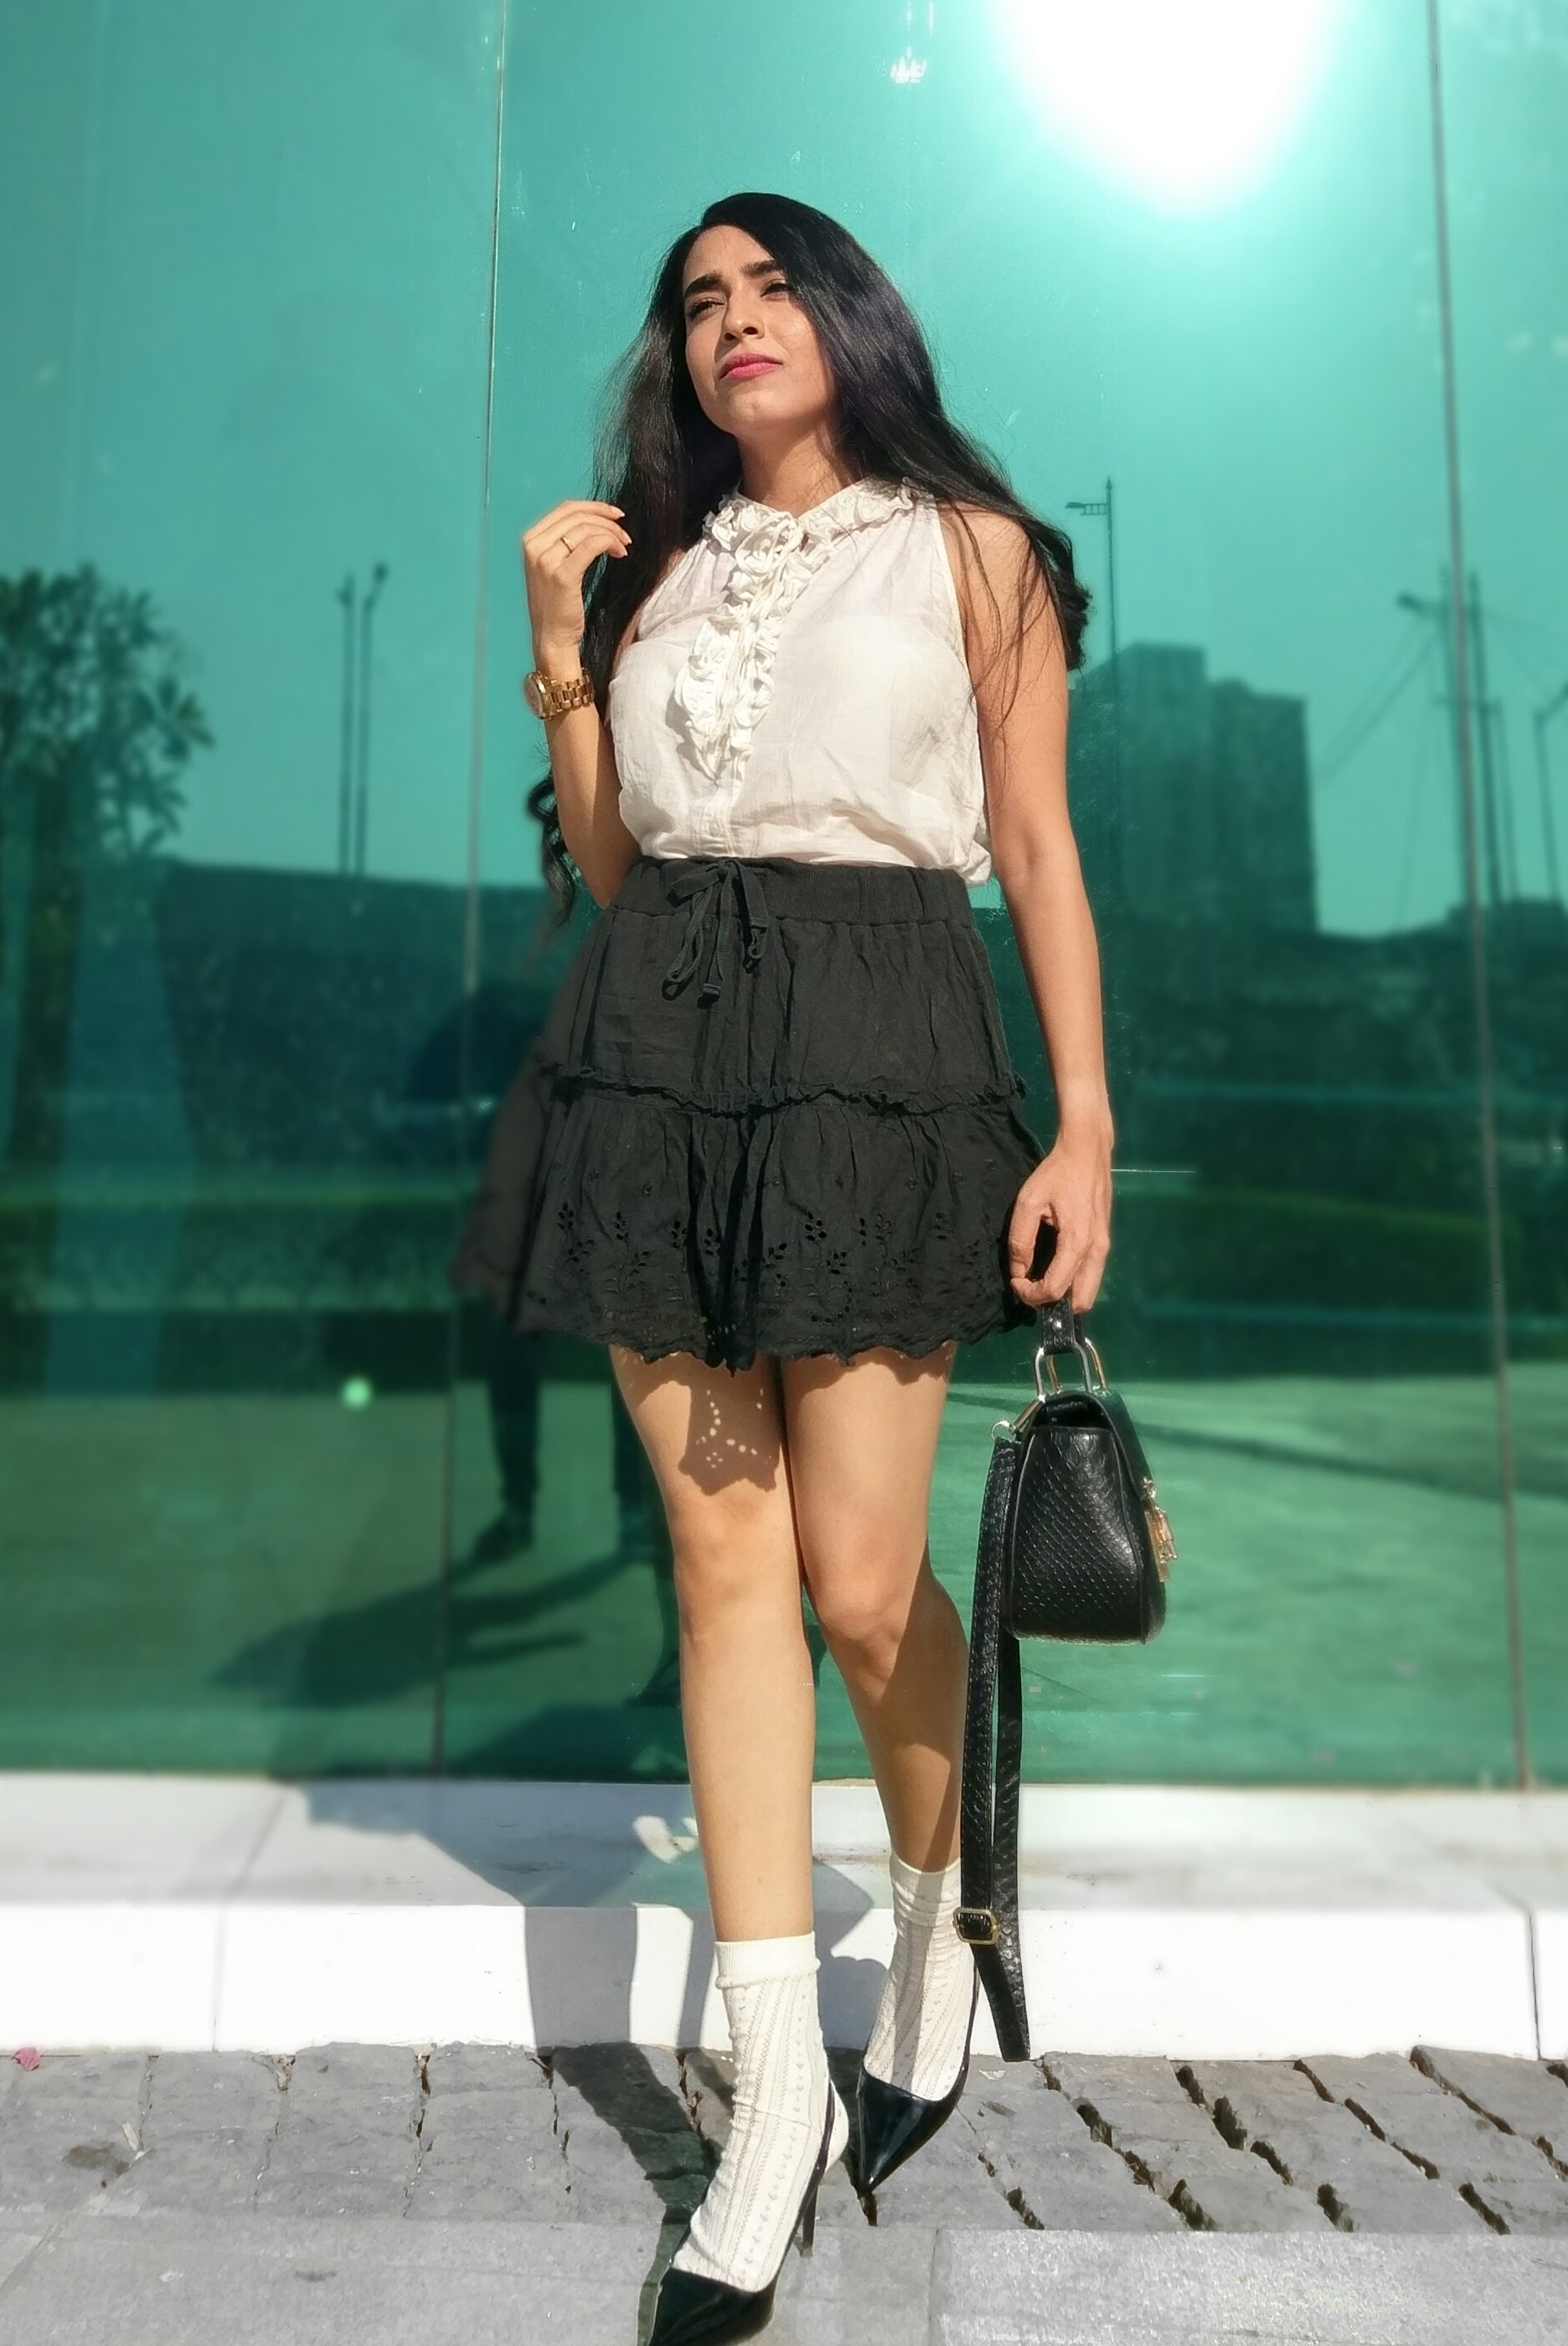 Monochrome street style fashion blog